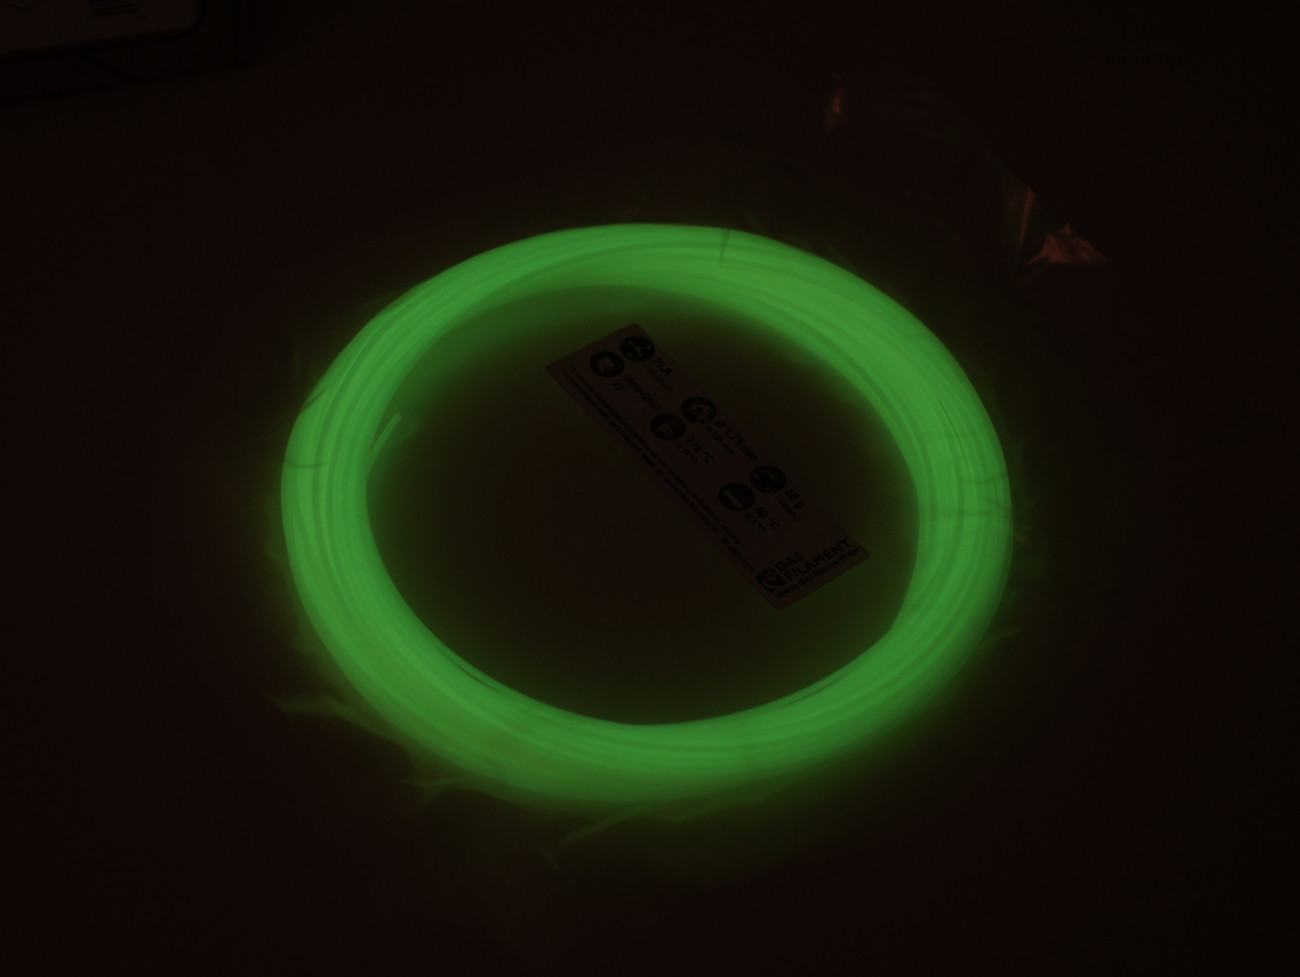 07_Glow.jpg